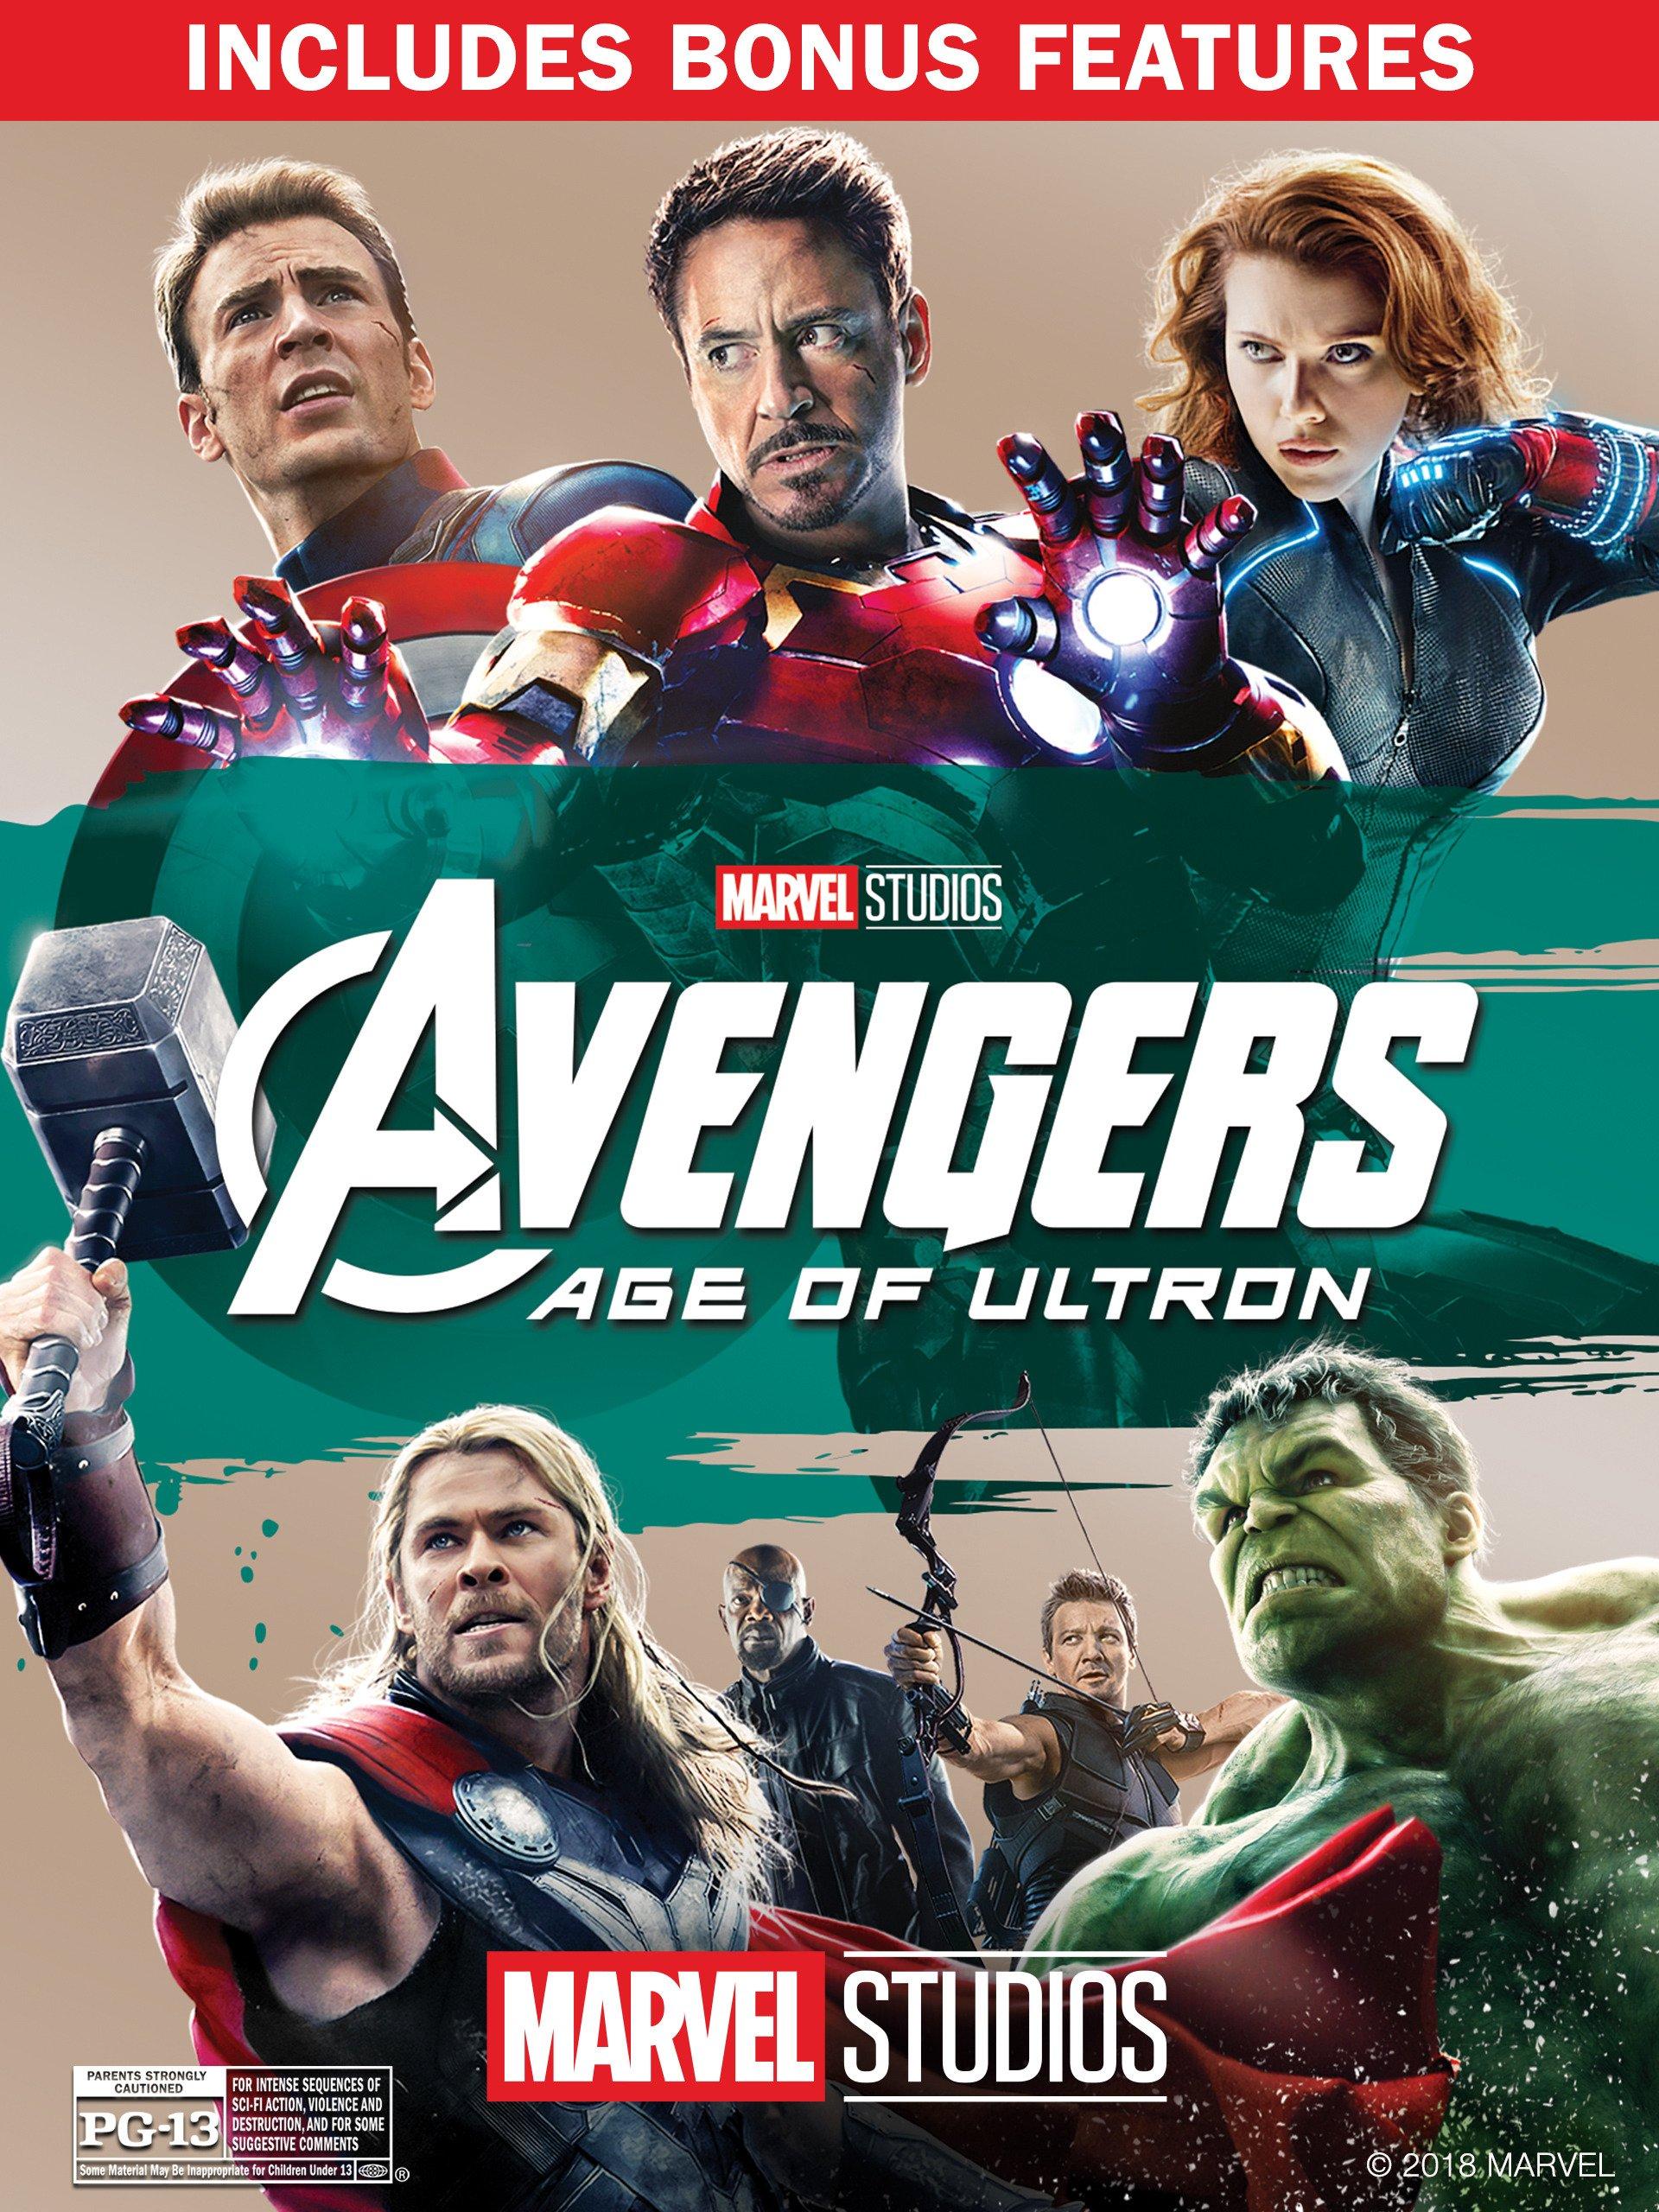 amazon com marvel s avengers age of ultron plus bonus features